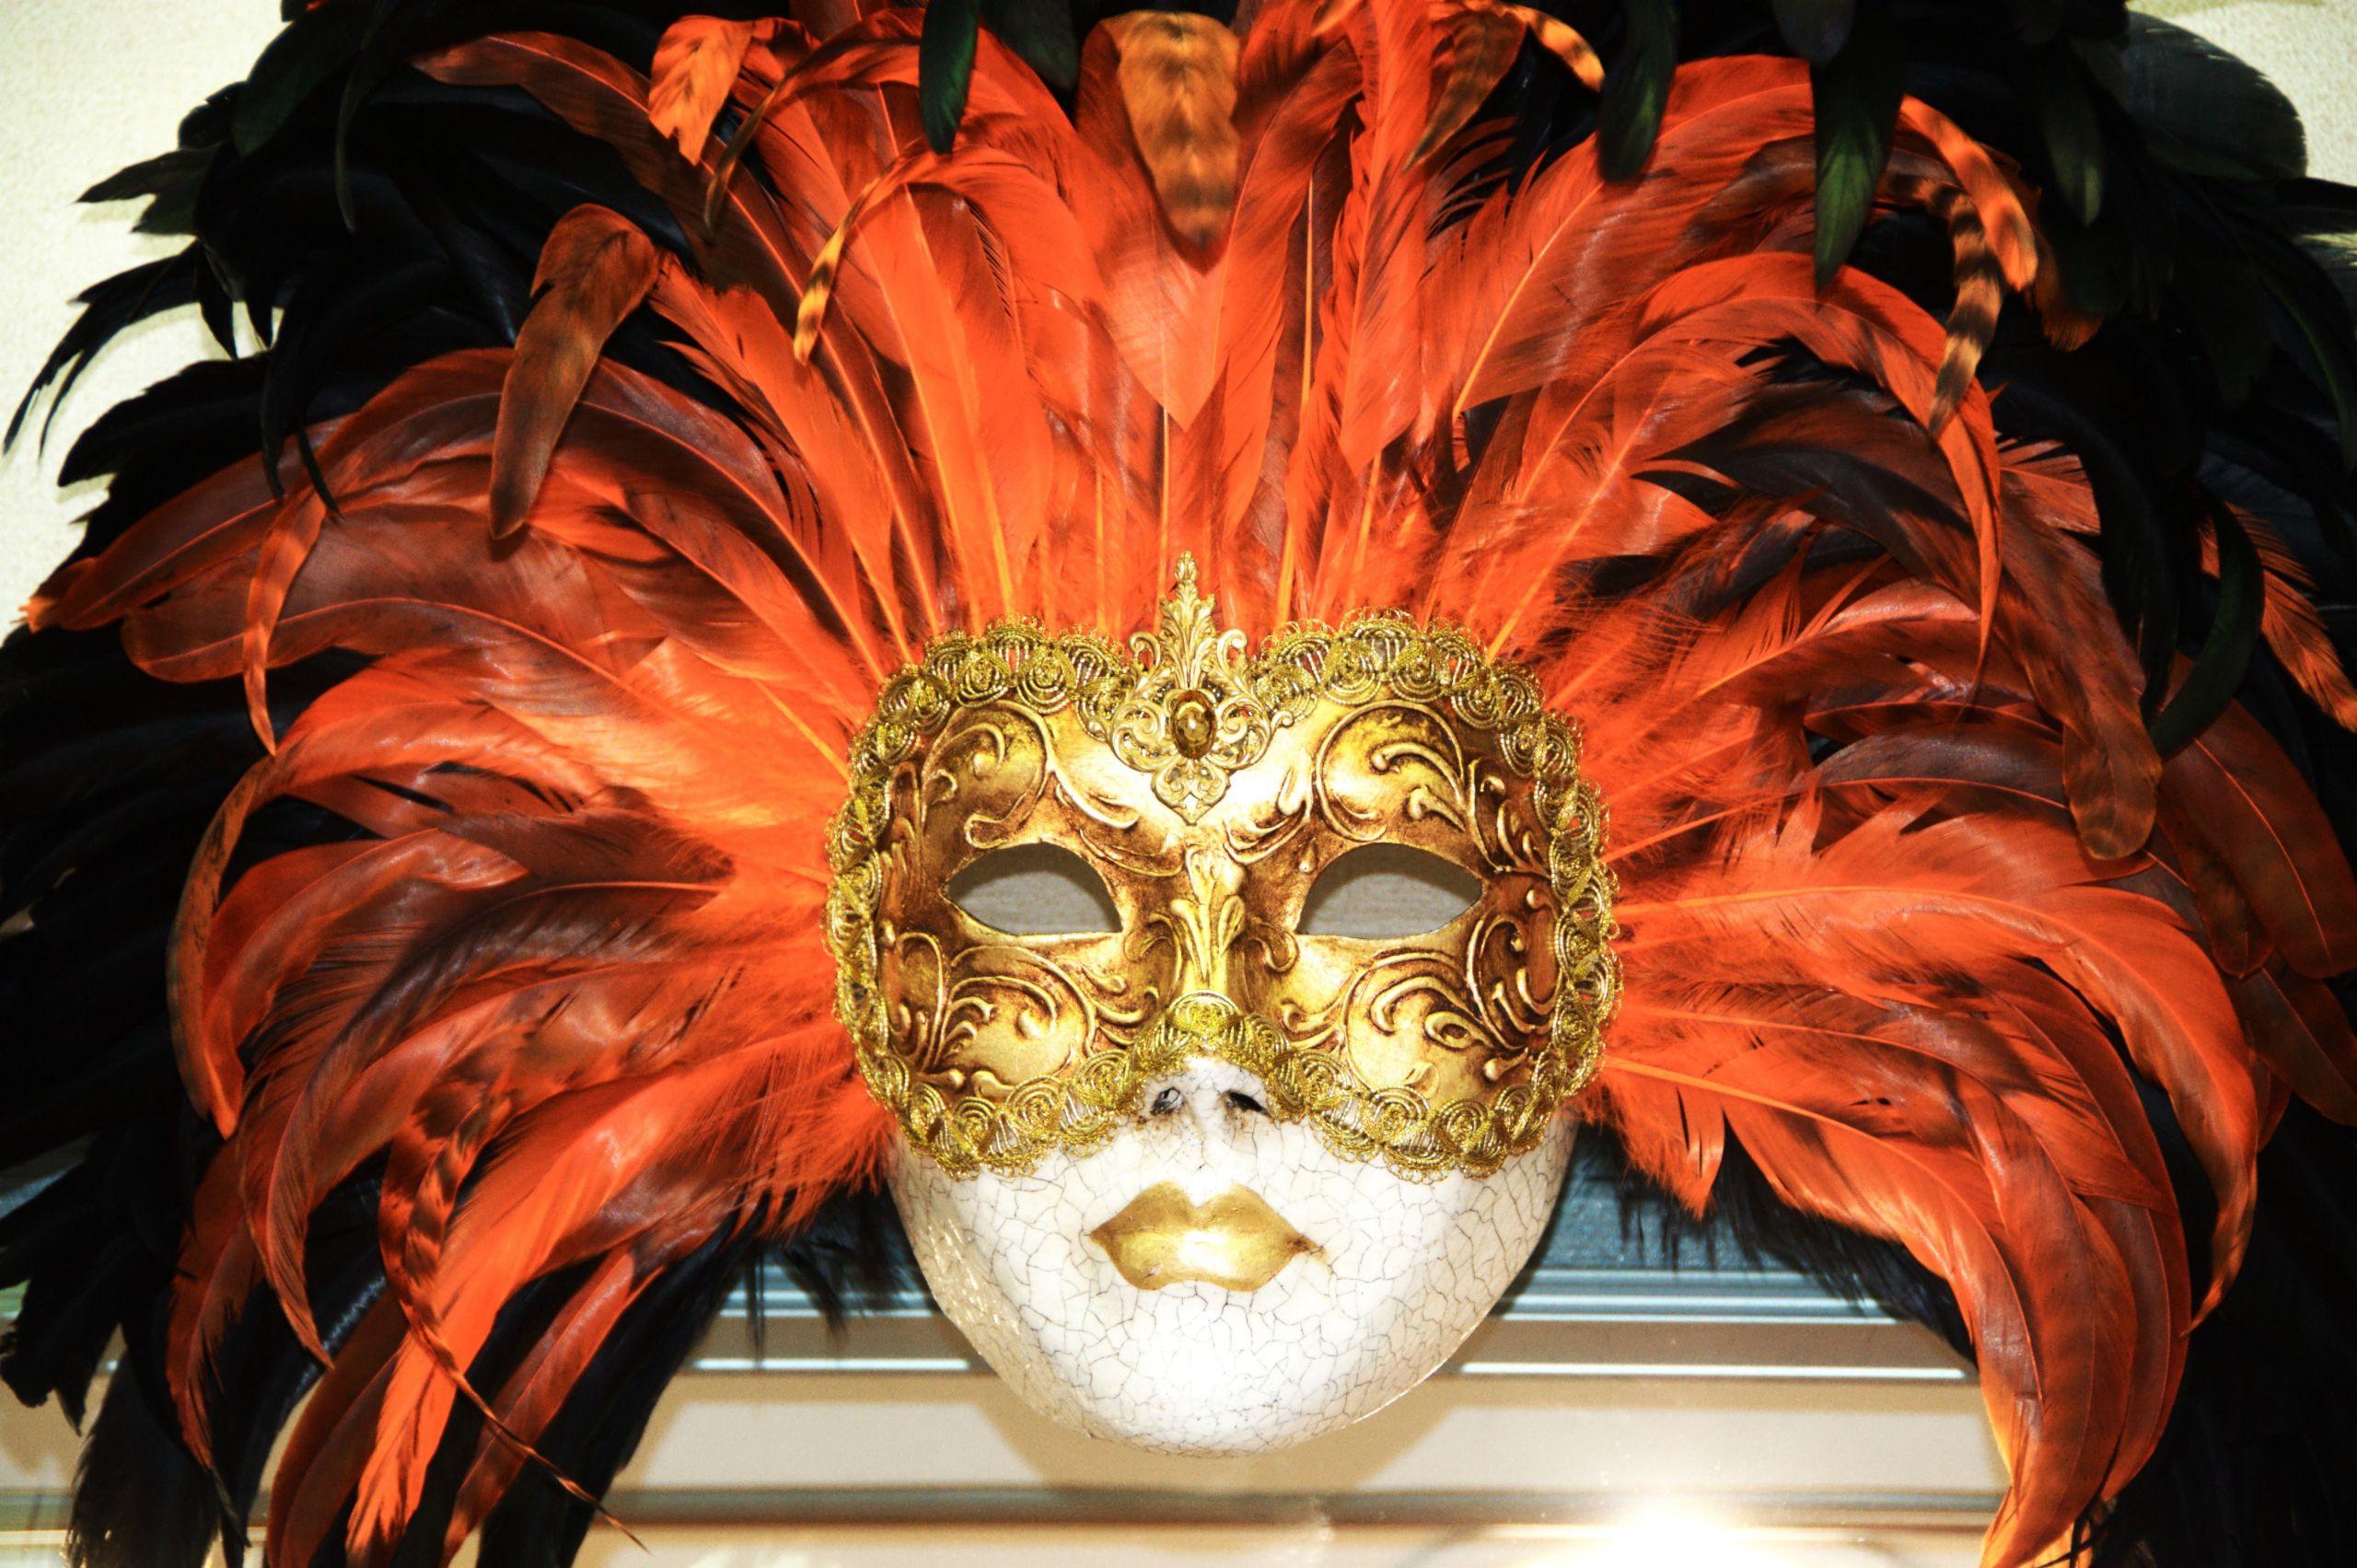 Venetian Carnival Mask Maschera di Carnevale Venice Italy Creative mons by gnuckx